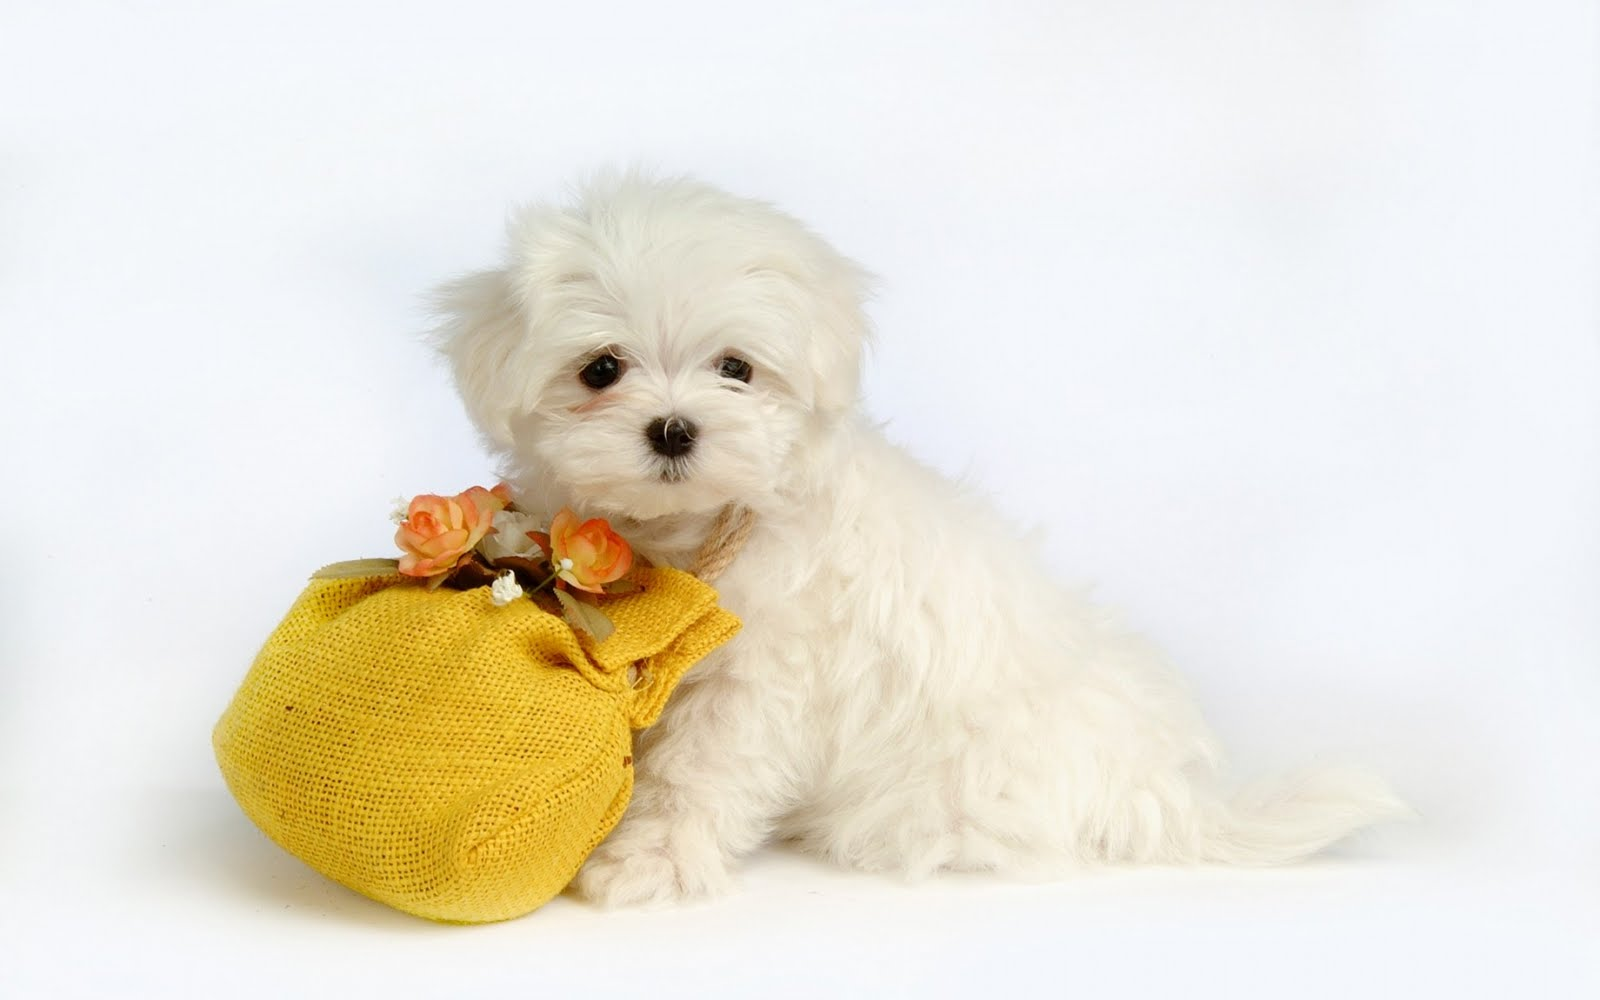 Cute Puppy Wallpaper   Wide1680x1050 Hd Desktop Wallpaper 1600x1000